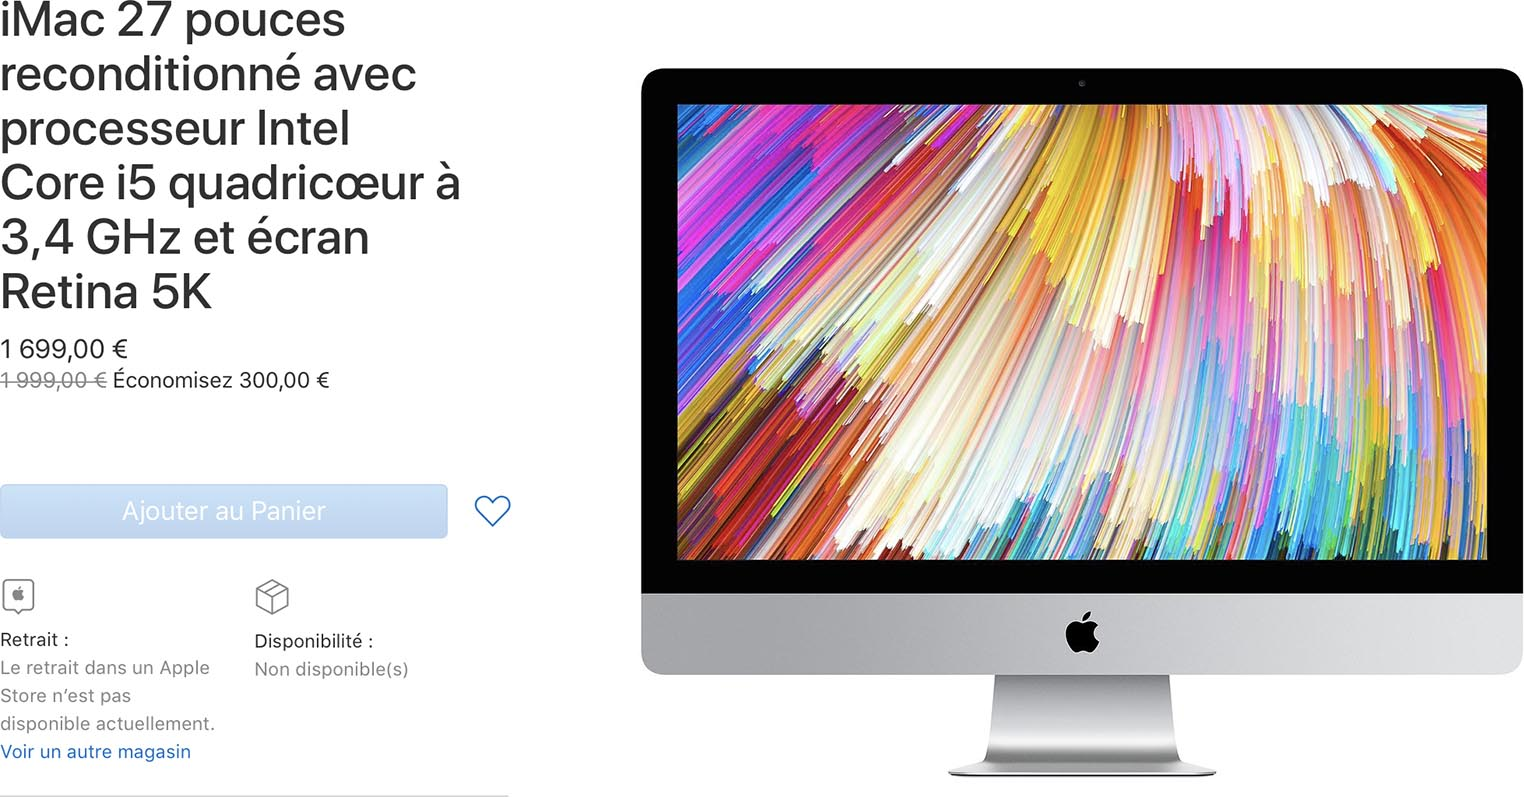 iMac Refurb Store